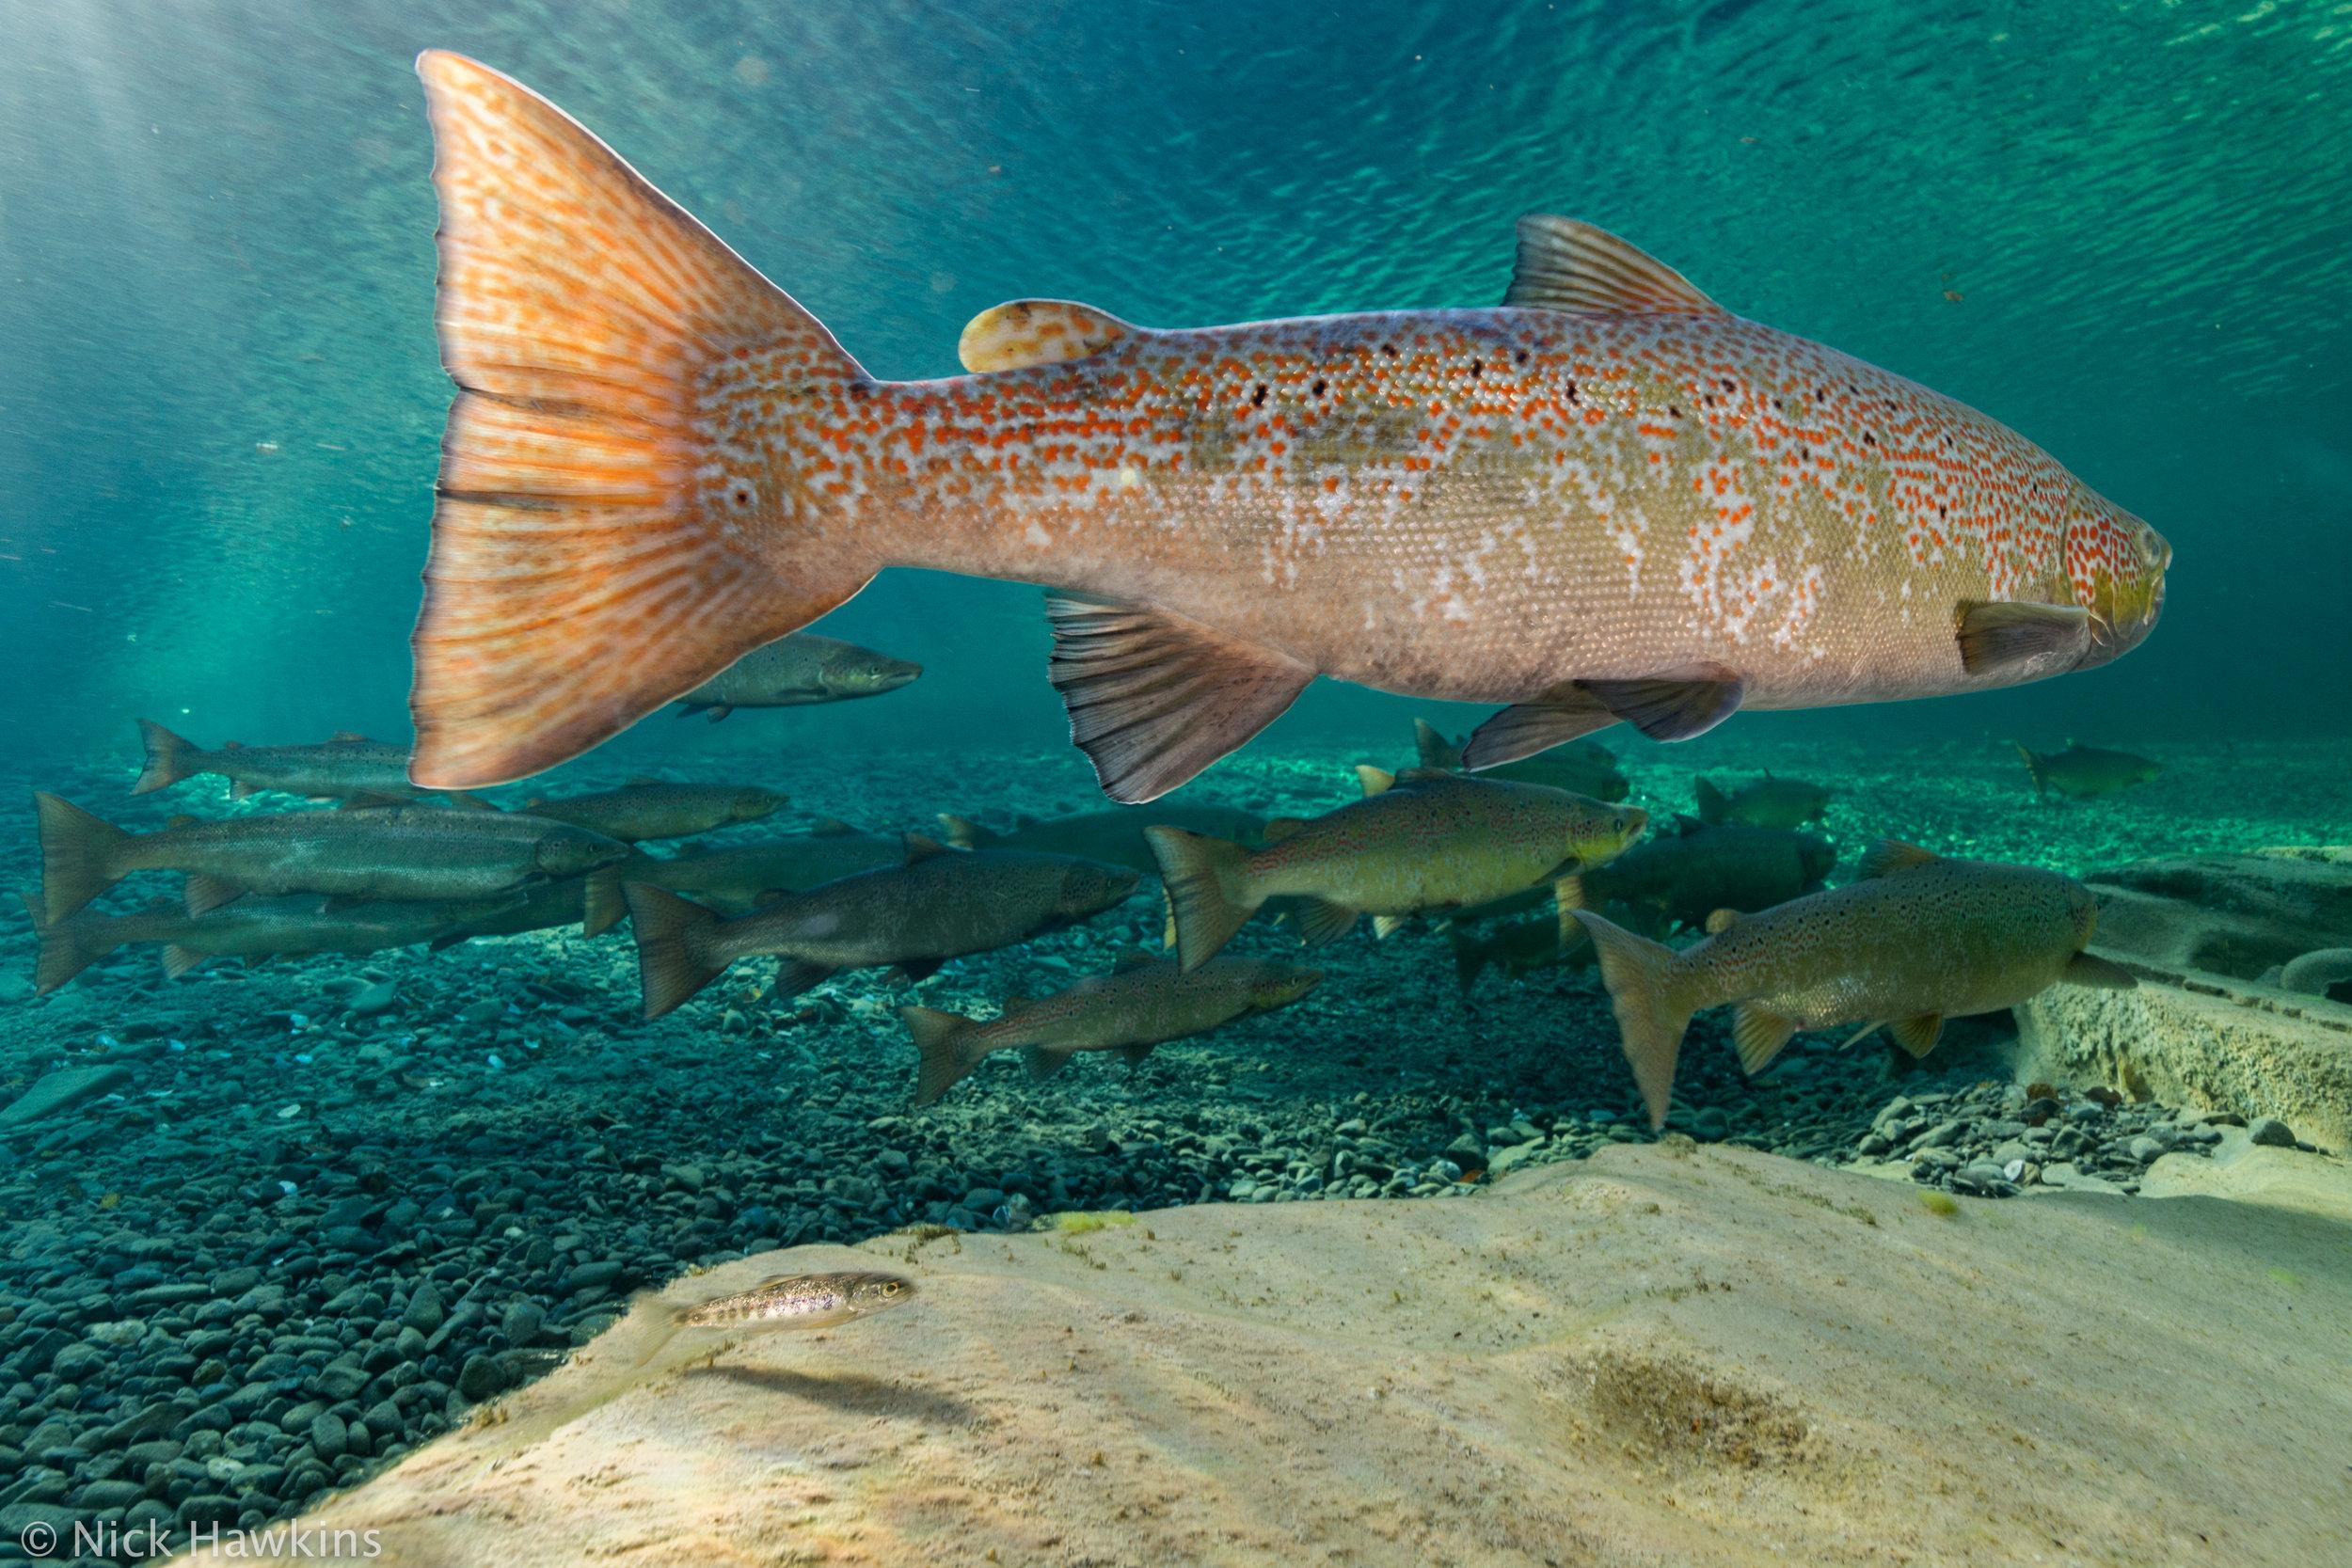 Gaspé-Saving-Salmon-Nick-Hawkins-4019.jpg